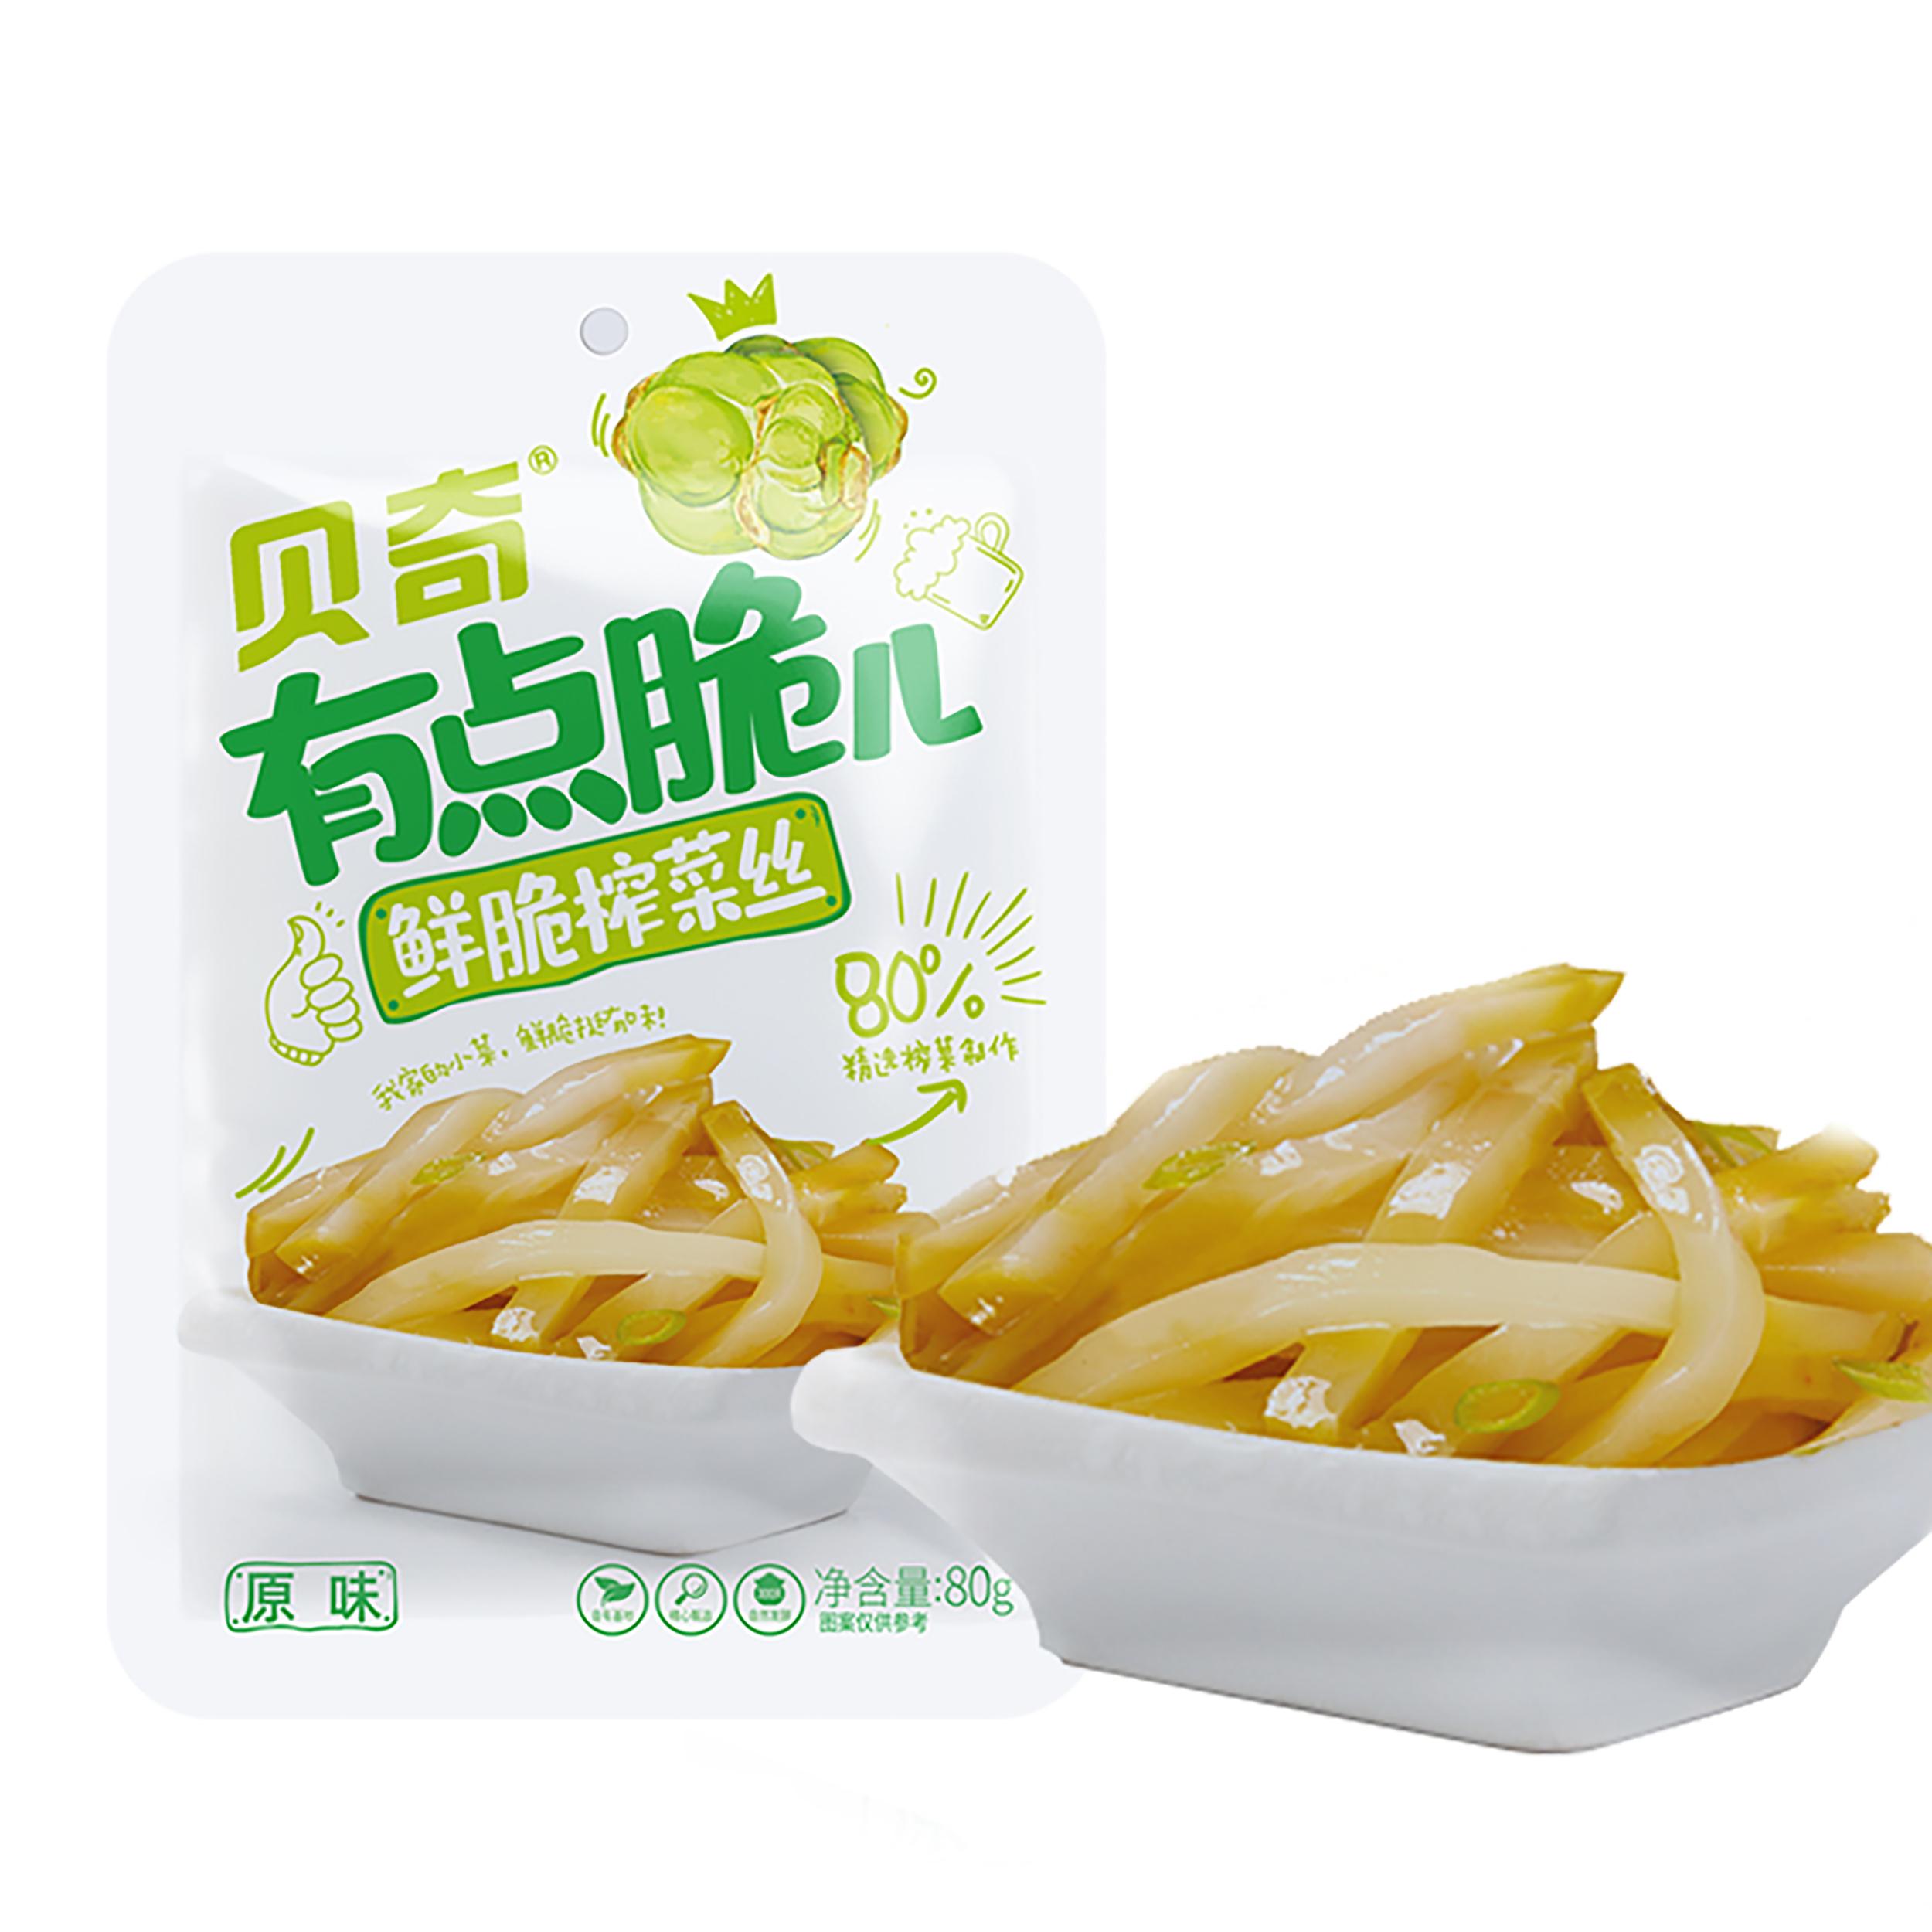 bob彩票有点脆儿鲜脆榨菜丝(原味)